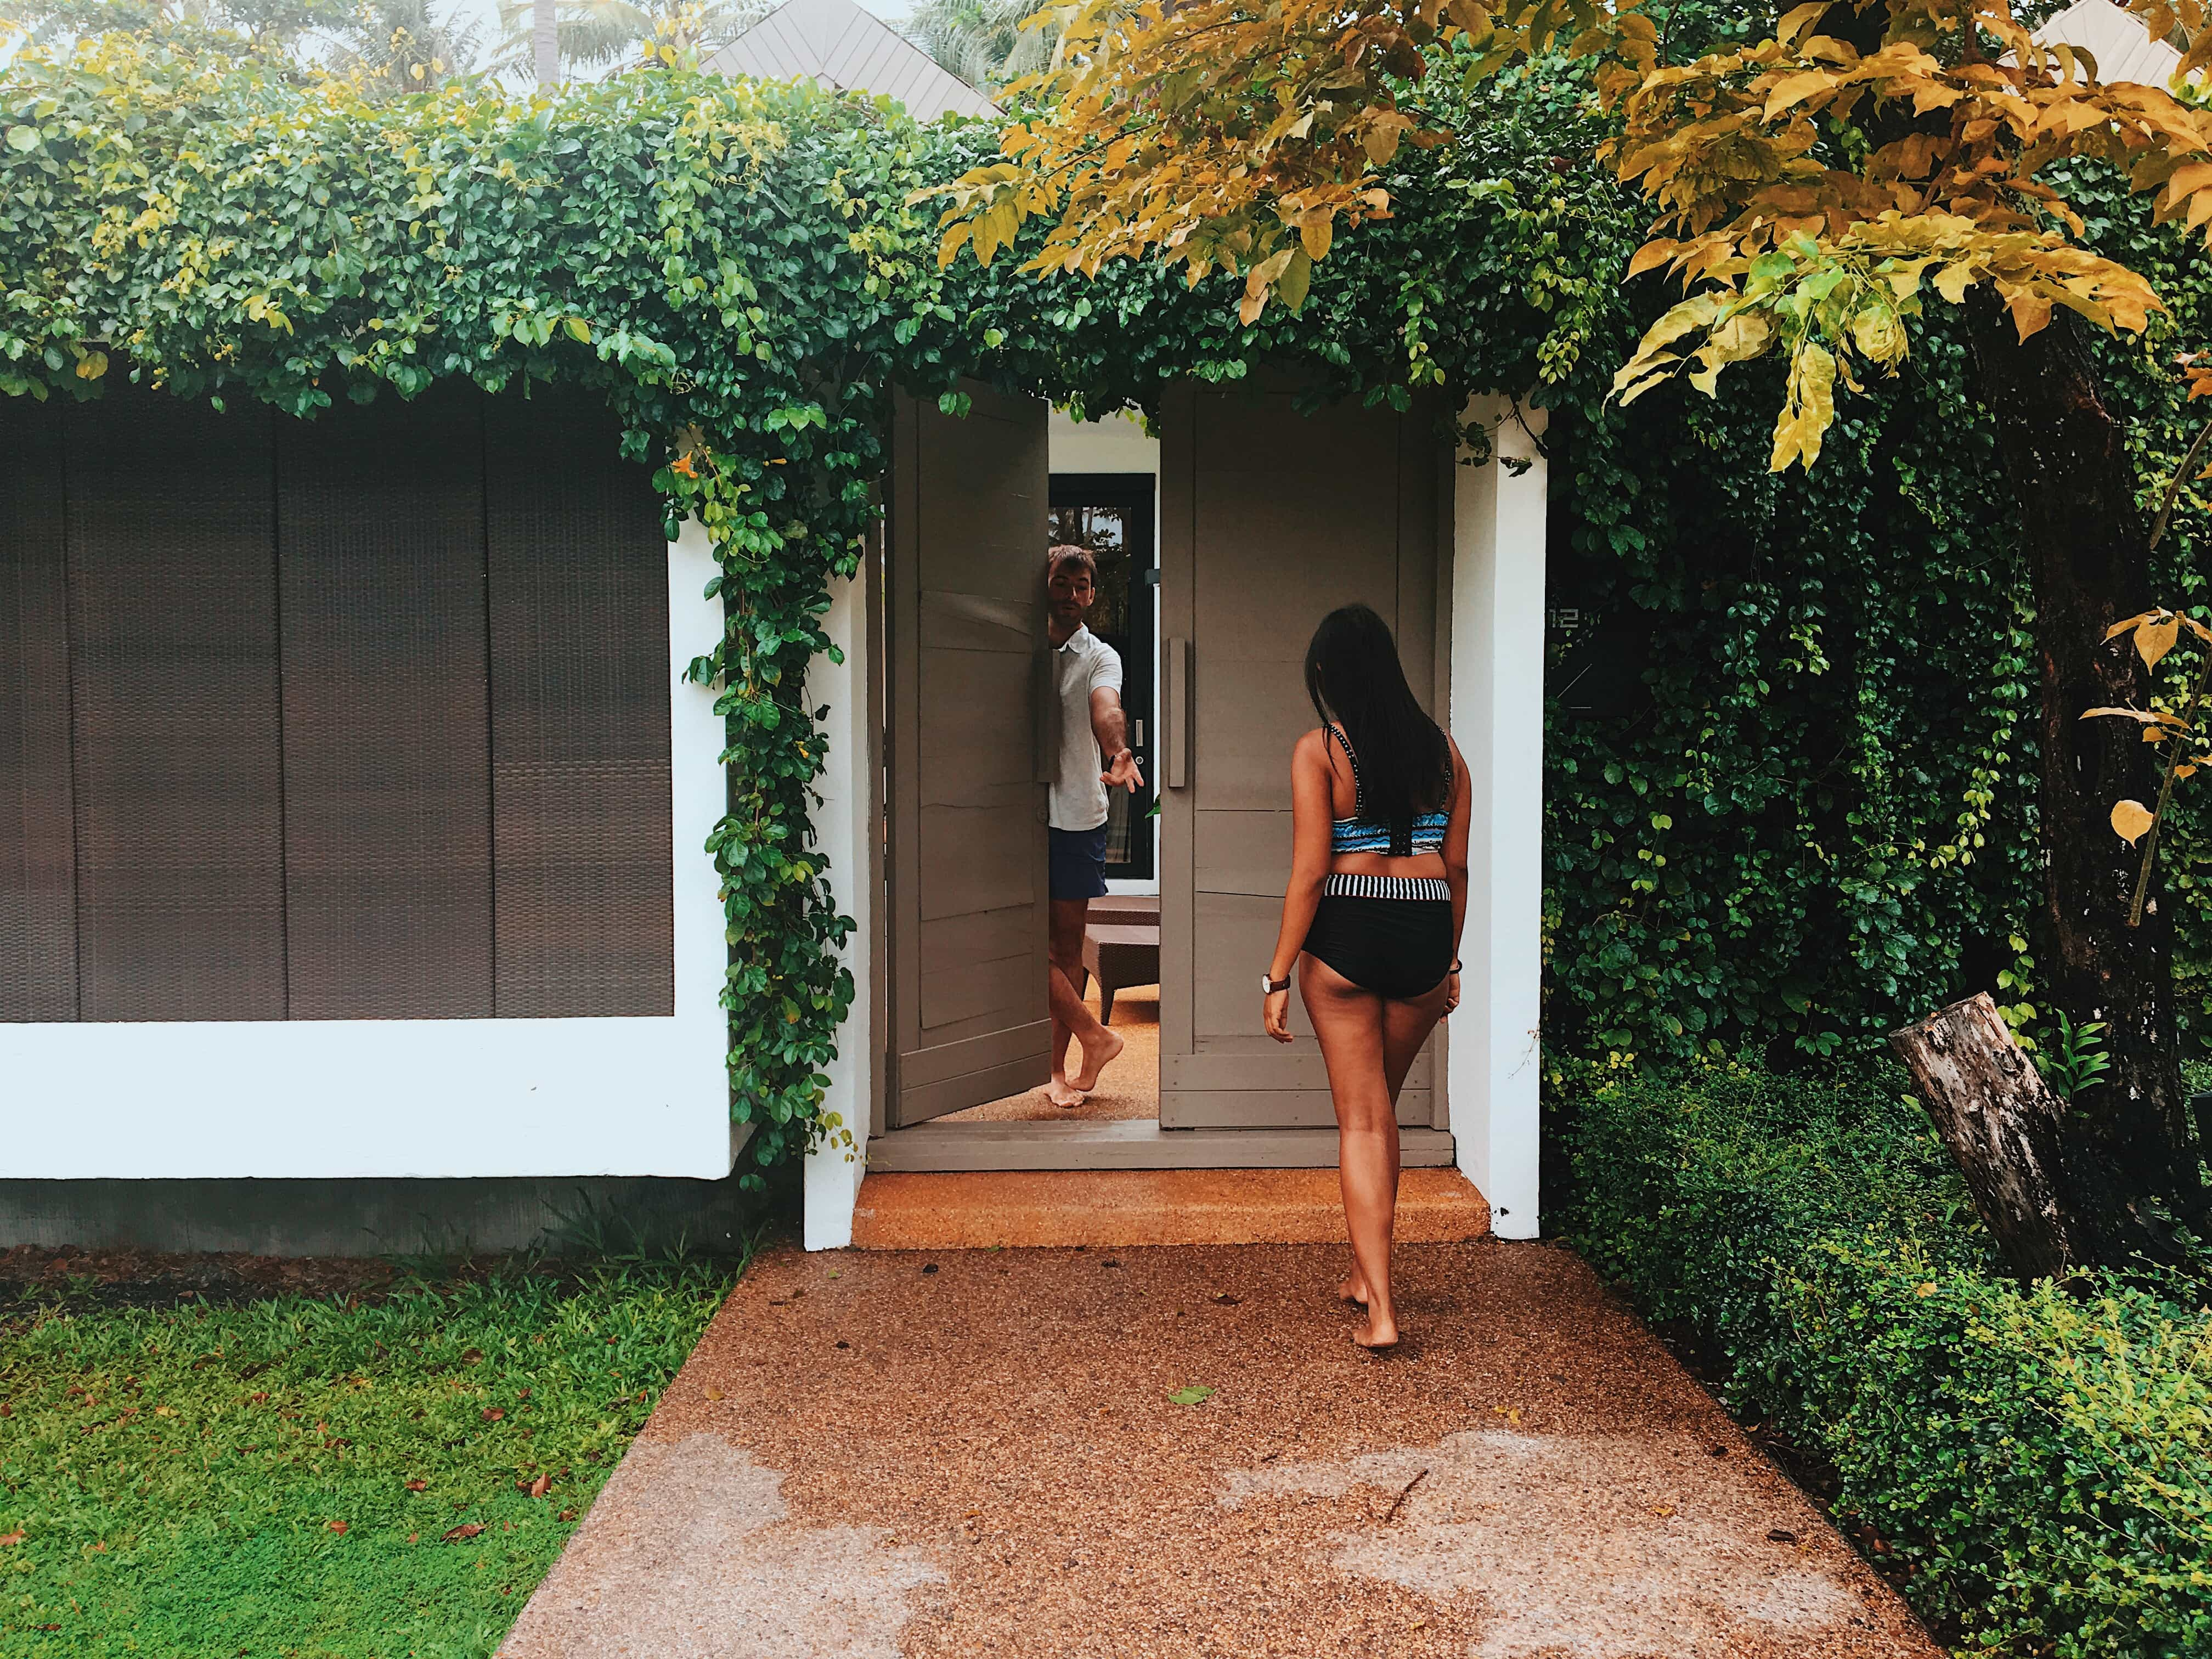 Entrance to the villa at X2 Koh Samui Resort